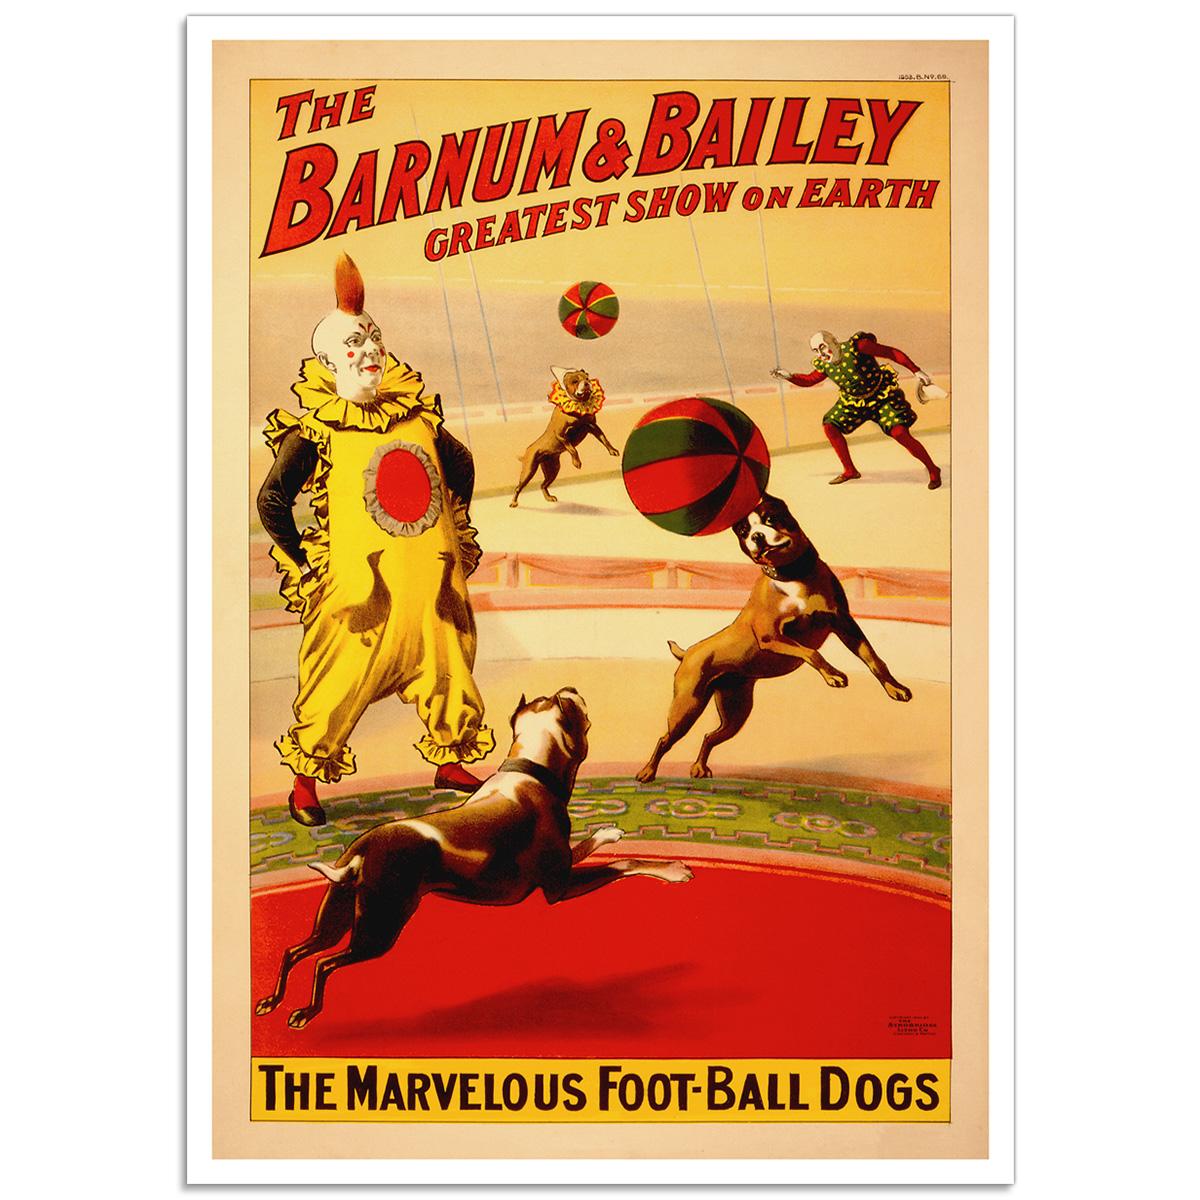 Circus Poster - Barnum & Bailey, The Marvellous Football Dogs